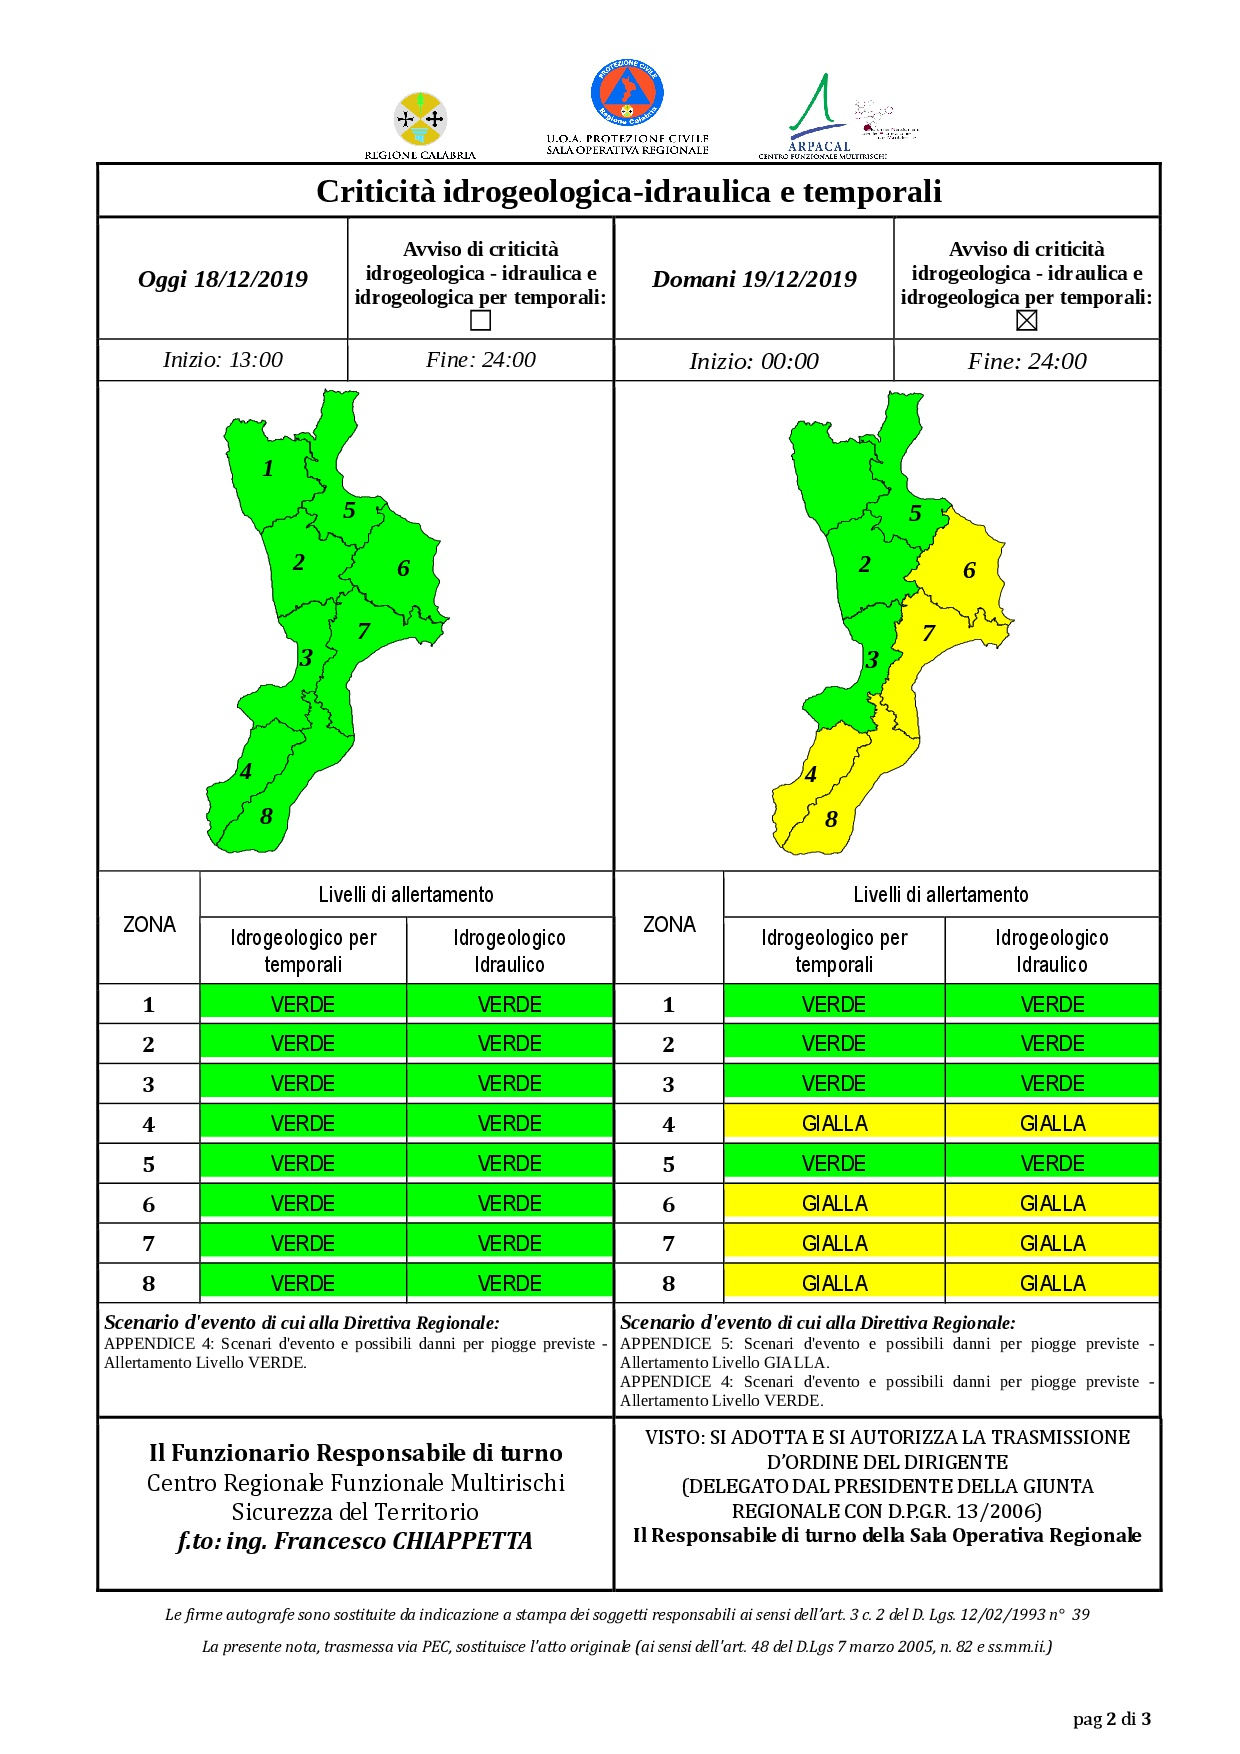 Criticità idrogeologica-idraulica e temporali in Calabria 18-12-2019